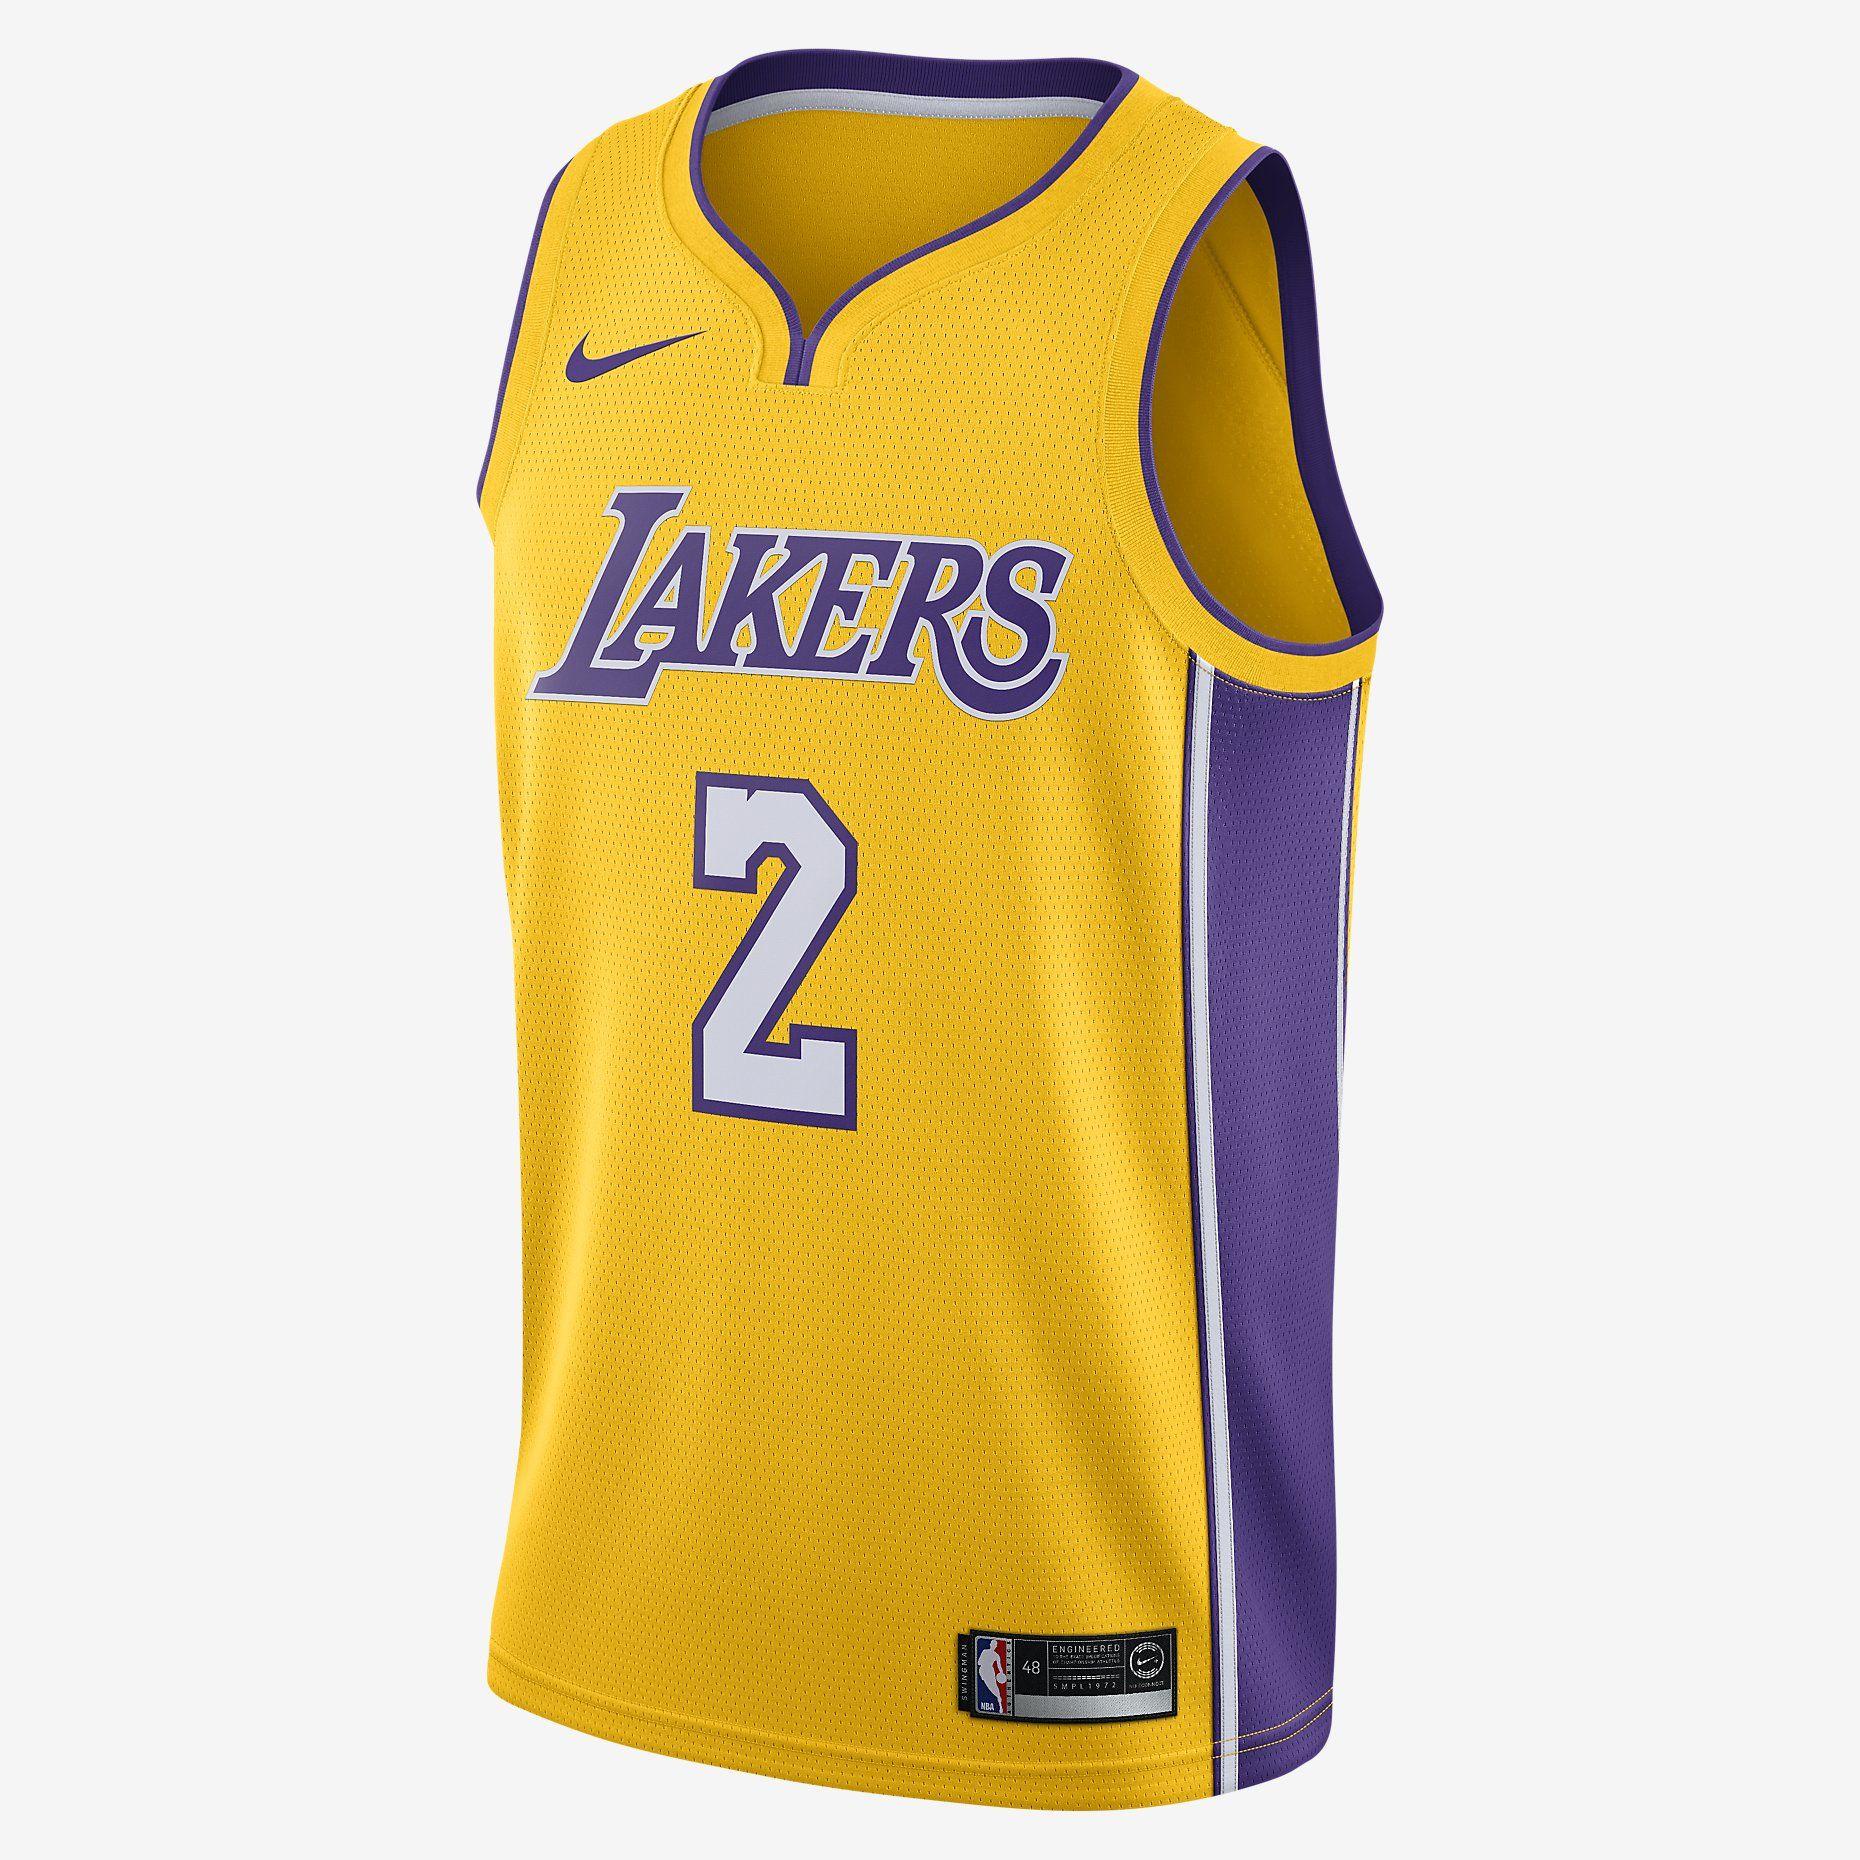 751cbcbfa4a45 LONZO BALL ICON EDITION SWINGMAN JERSEY (LOS ANGELES LAKERS) | Nike ...